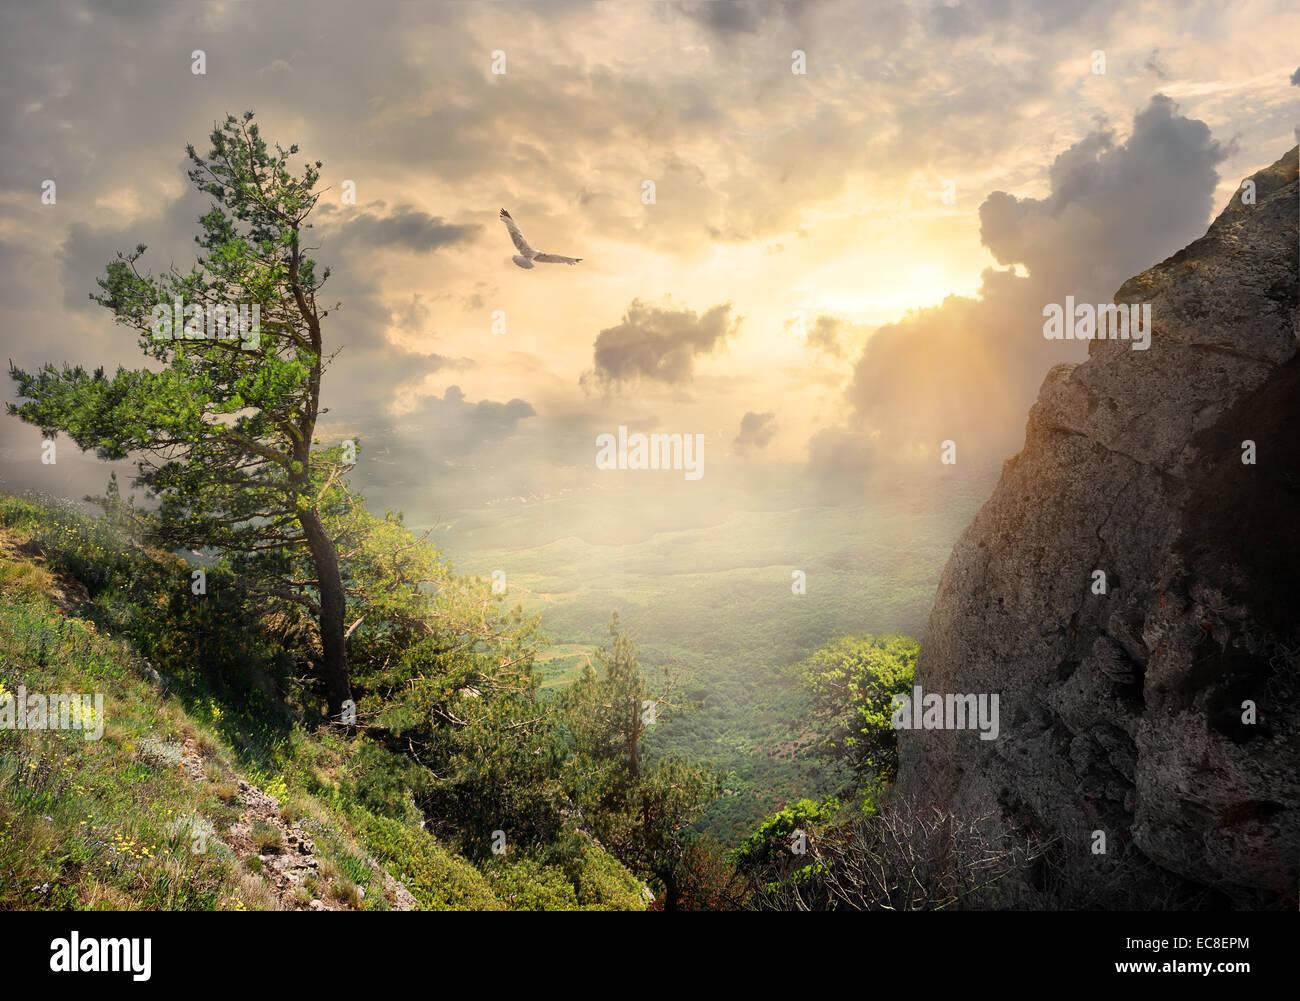 Bird over the big tree on mountain - Stock Image